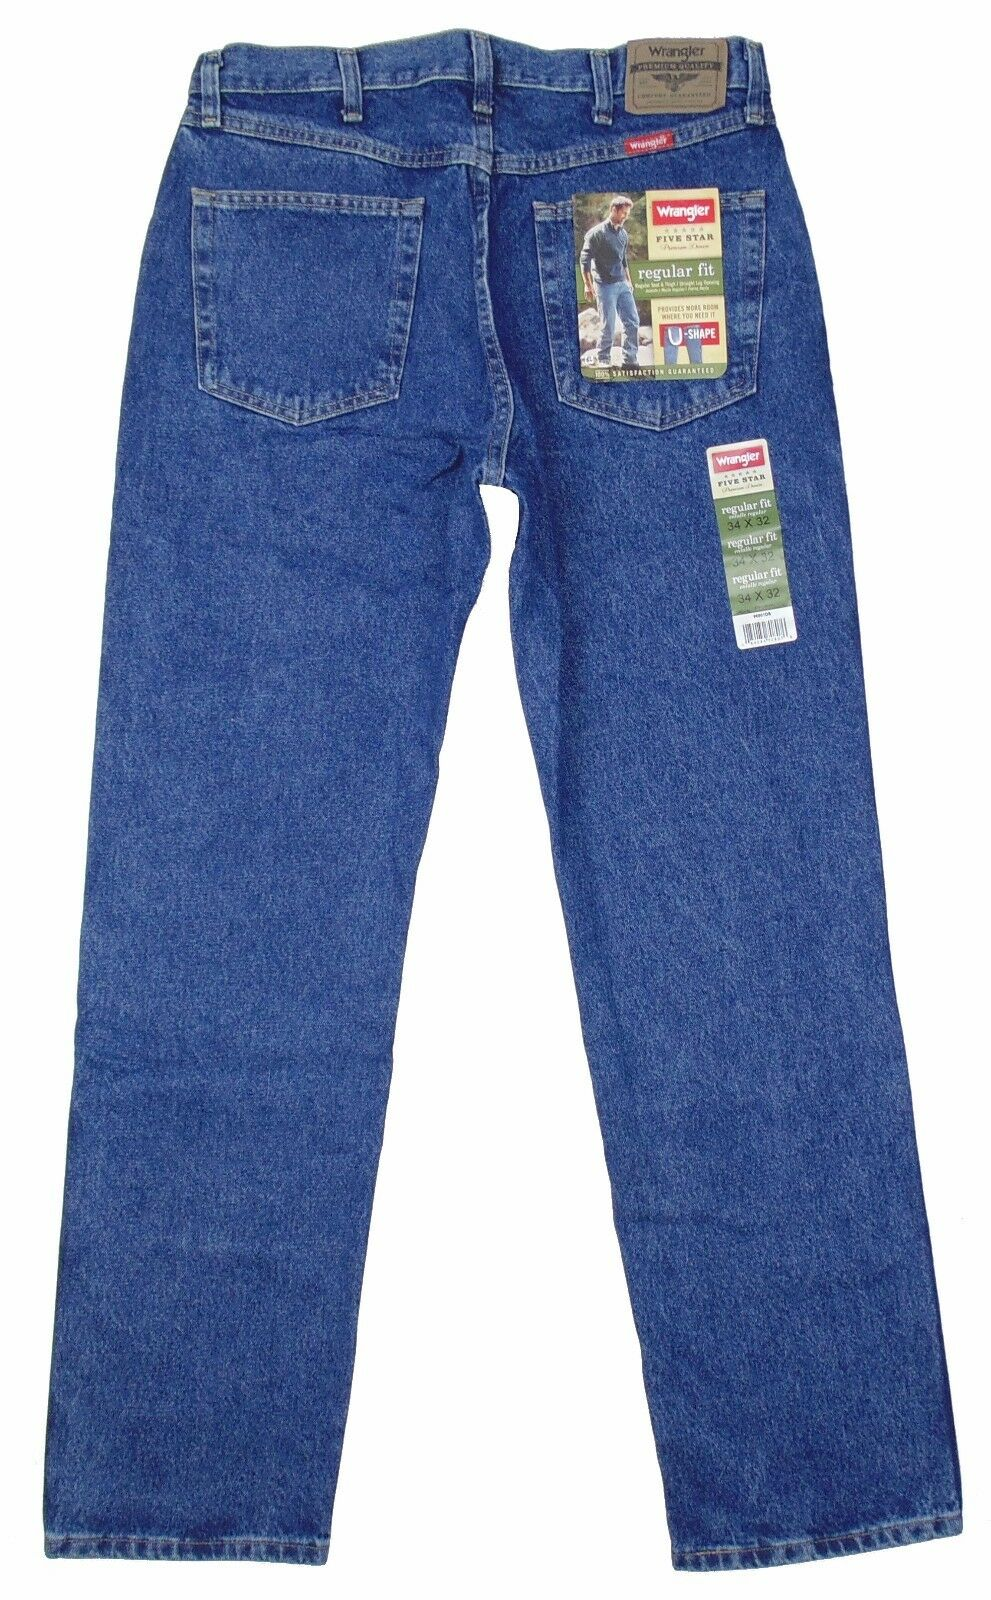 Wrangler Jeans Boys New Size 32 x 30 Regular fit Blue Five Star